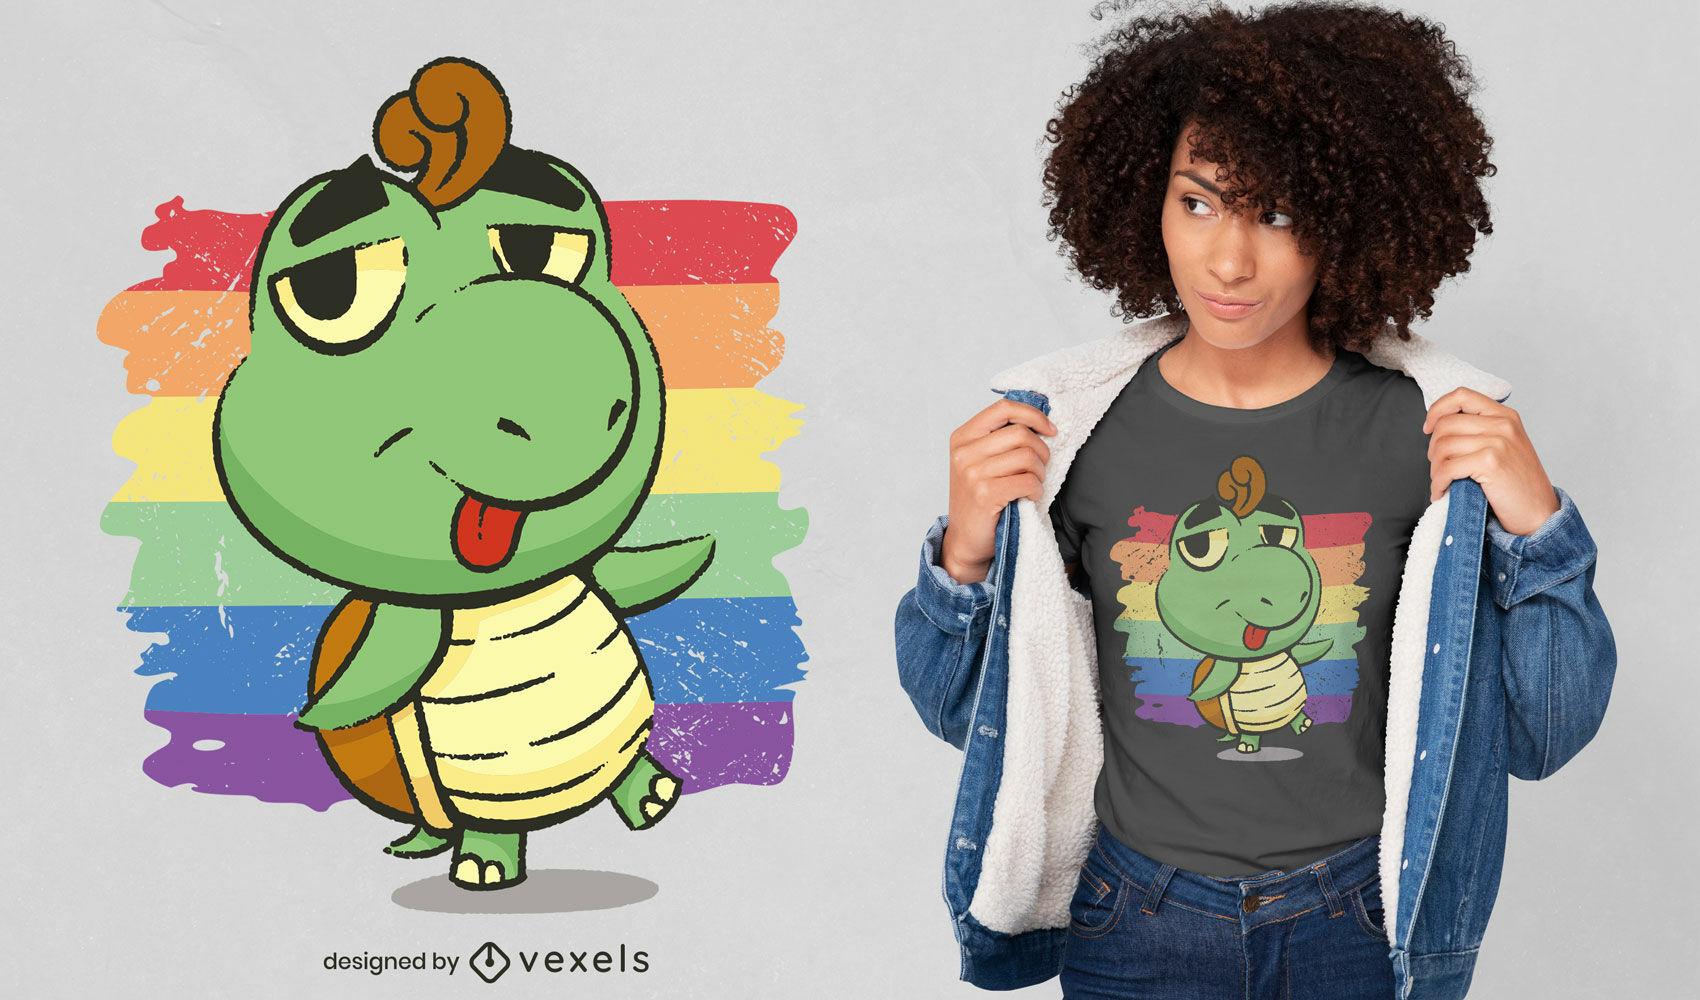 Dise?o de camiseta de dibujos animados de tortugas y arcoiris.